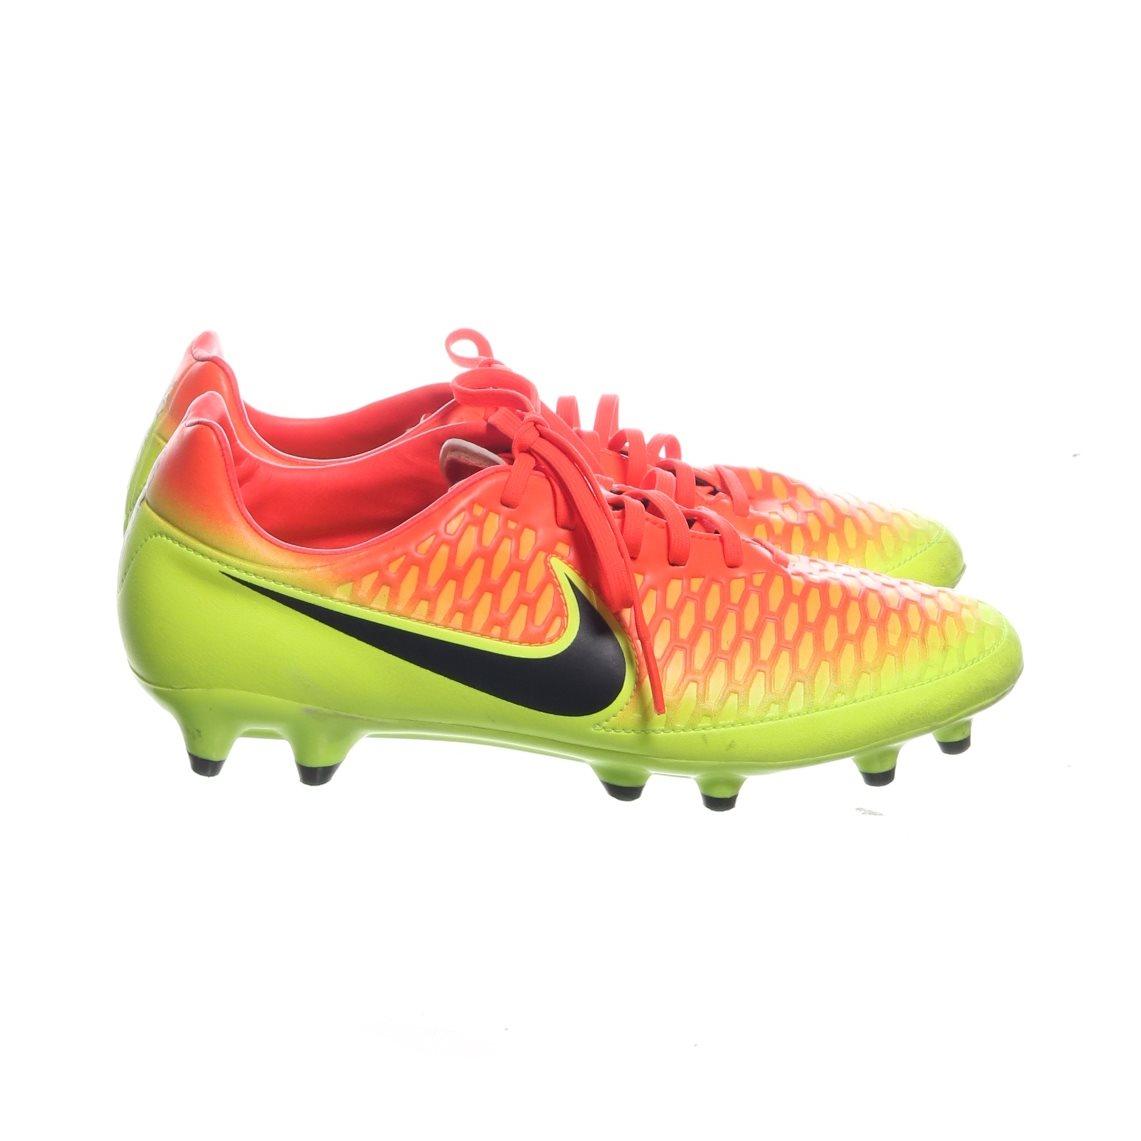 new concept 6c454 cb902 Nike Magista, Fotbollsskor, Strl  41, Gul Orange